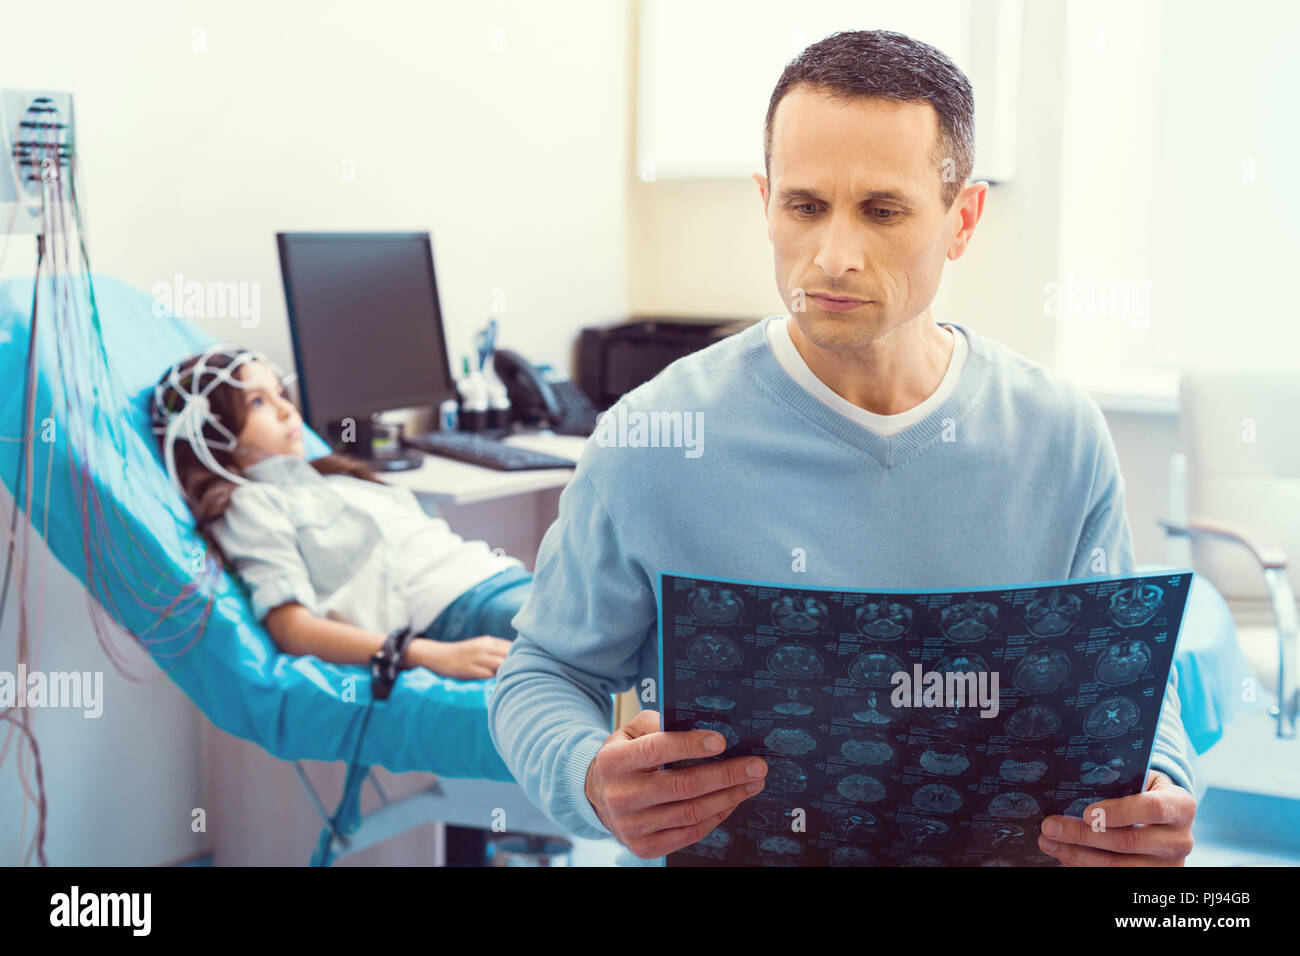 Worried parent examining mri scan of his poor daughter - Stock Image